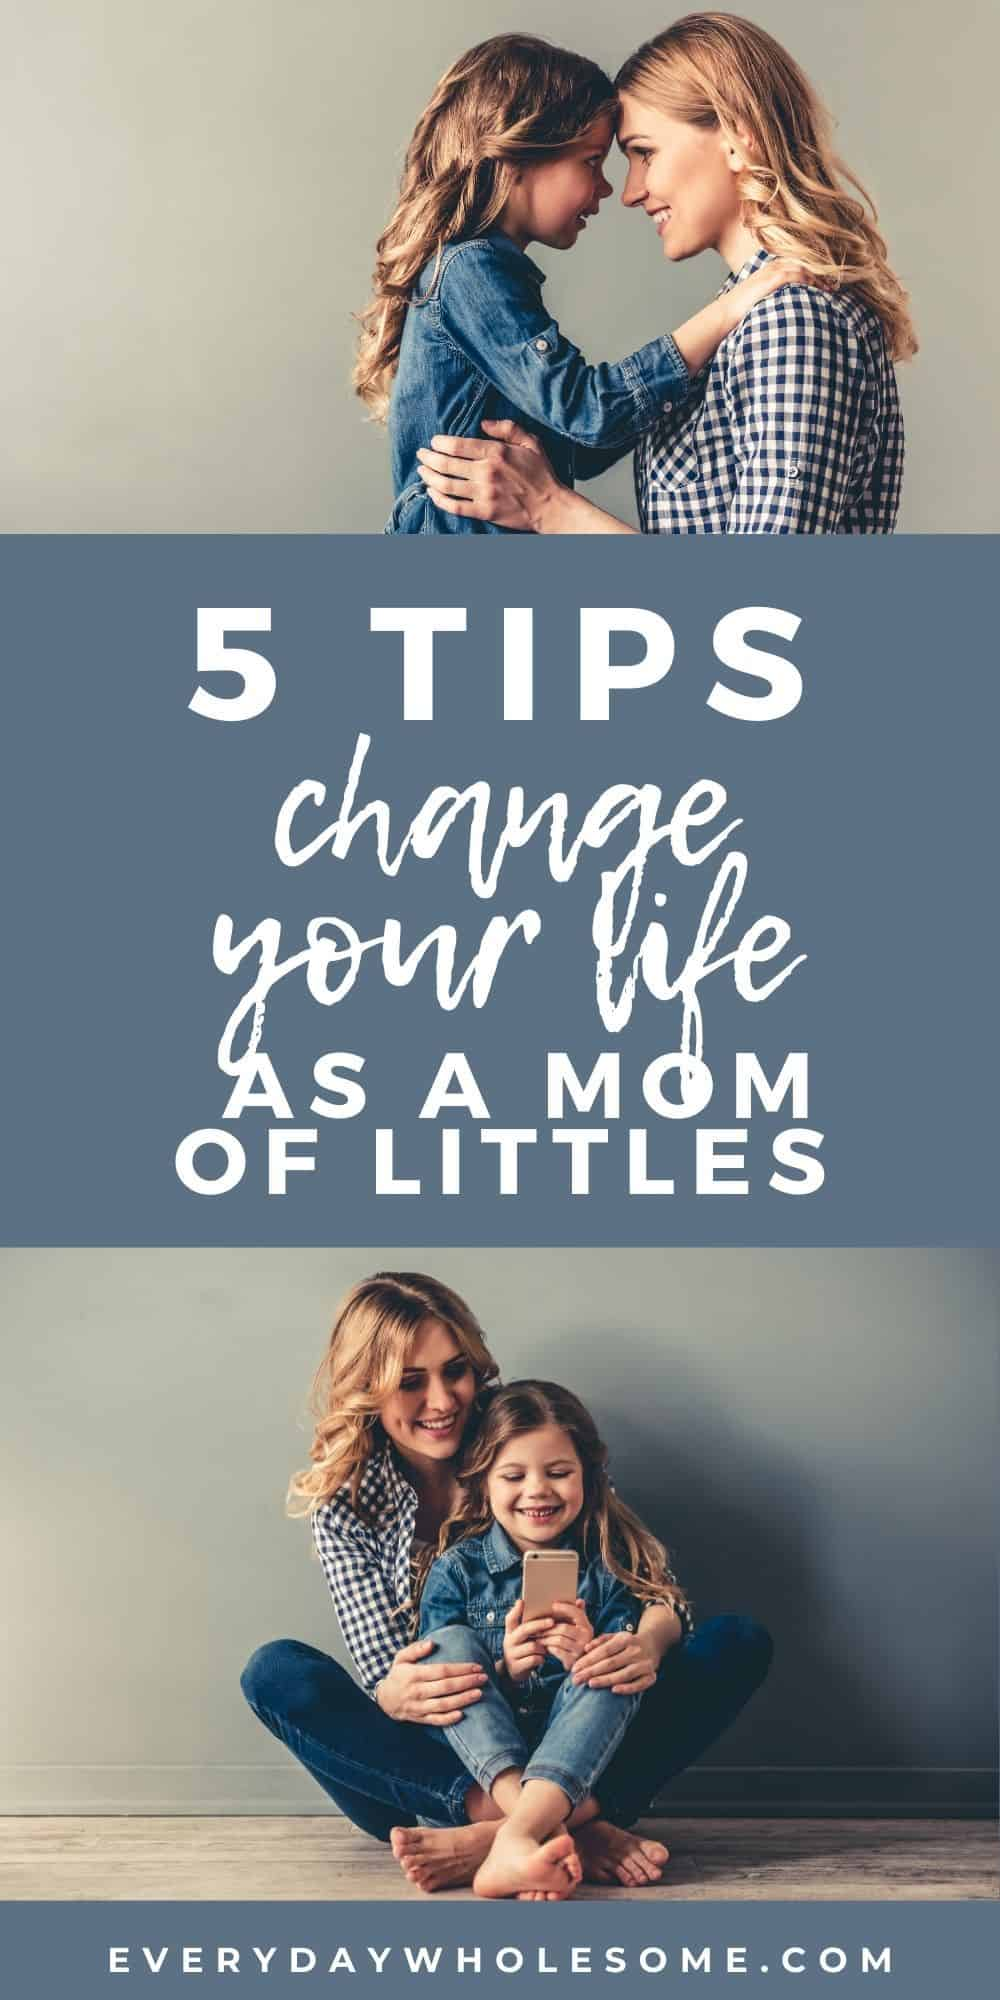 5 TIPS BRING JOY AS MOM OF LITTLES PIN